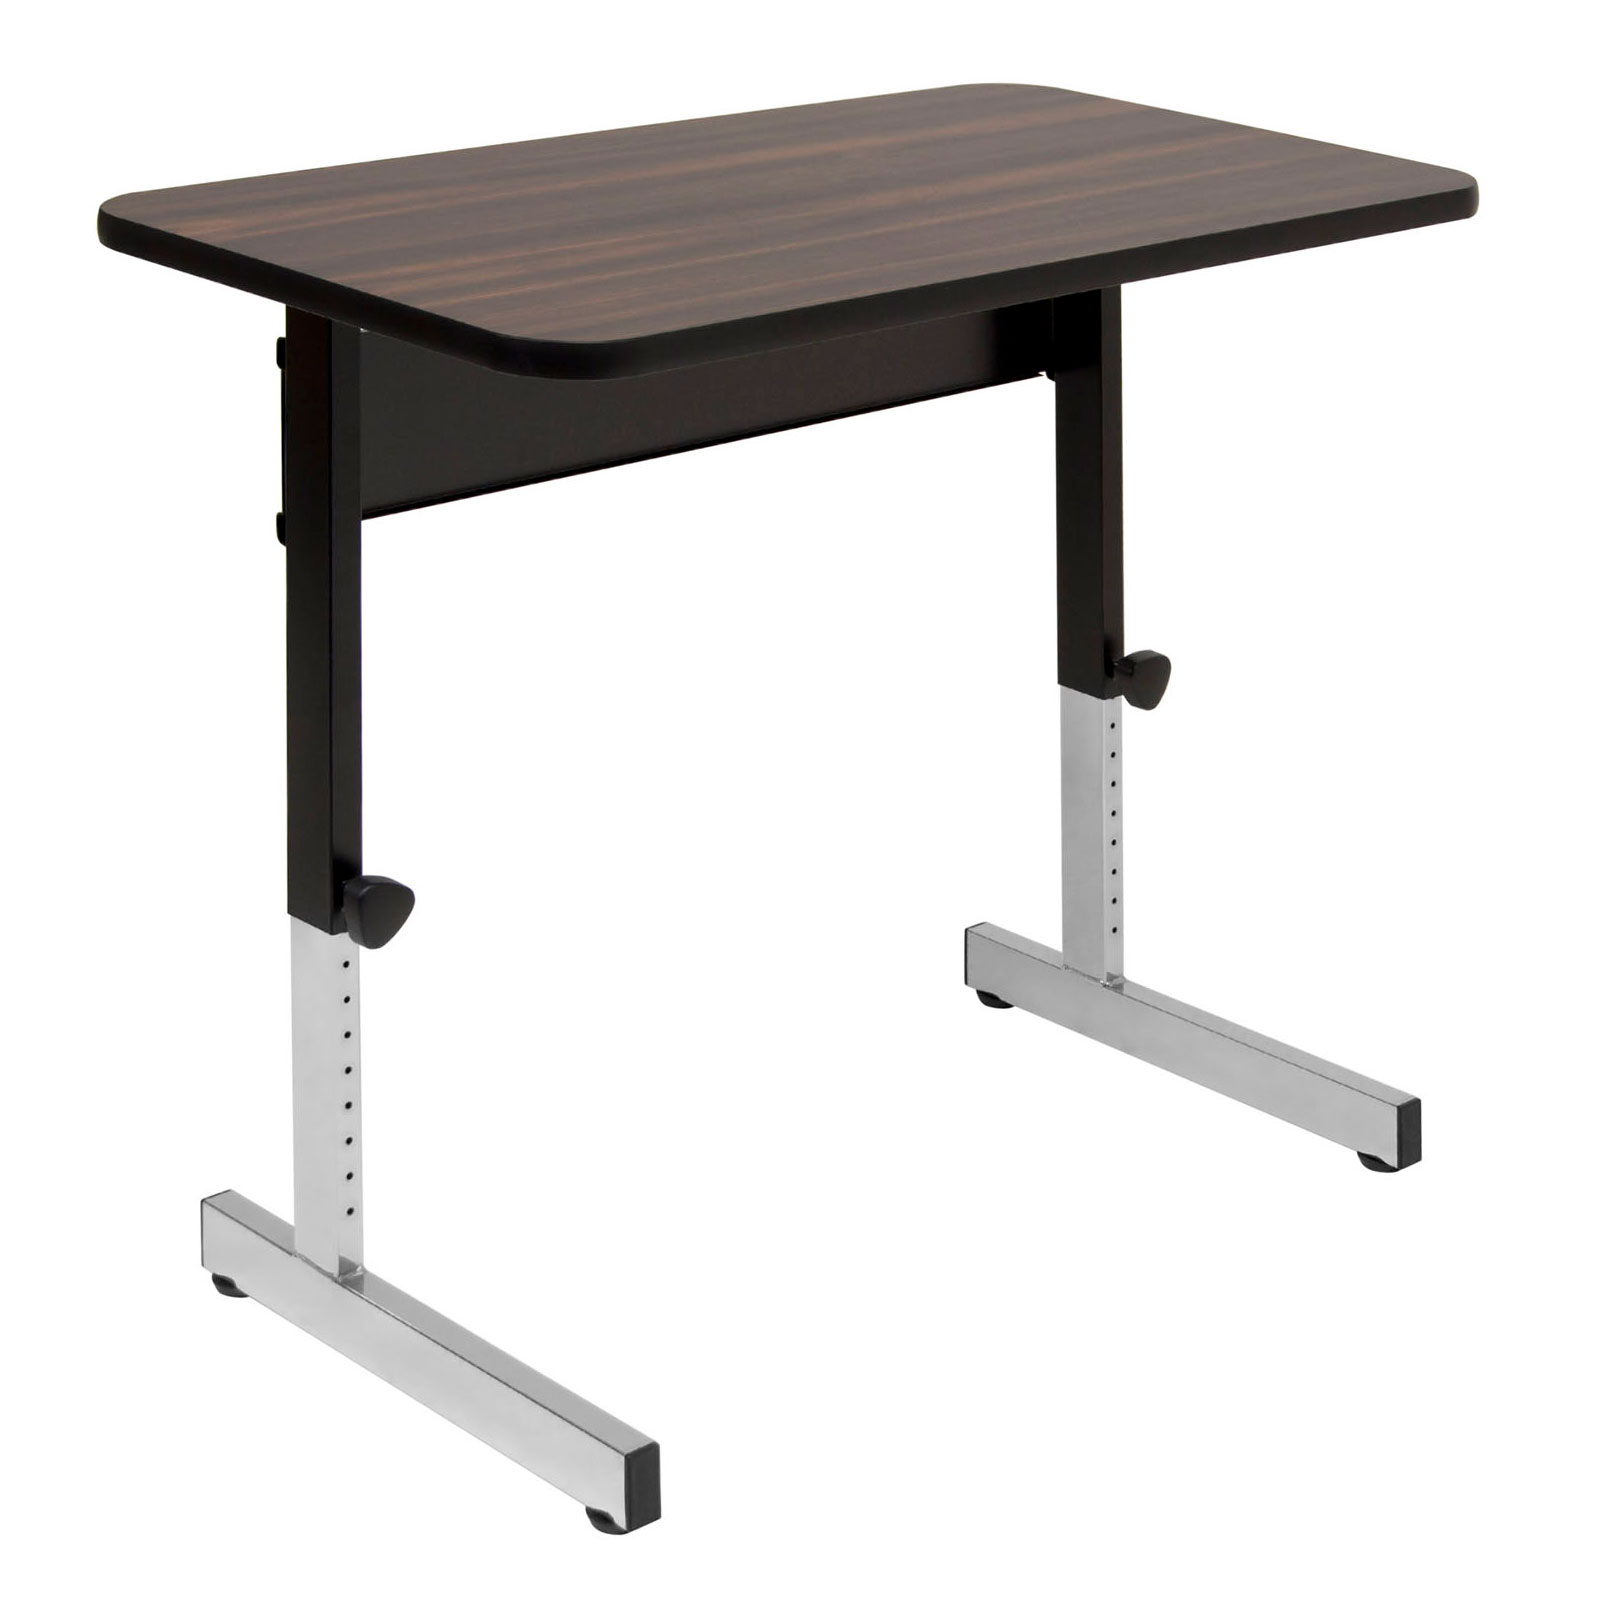 Studio Designs Adapta Table 36 X 20 Top Manual Height Adjule Desk Walnut